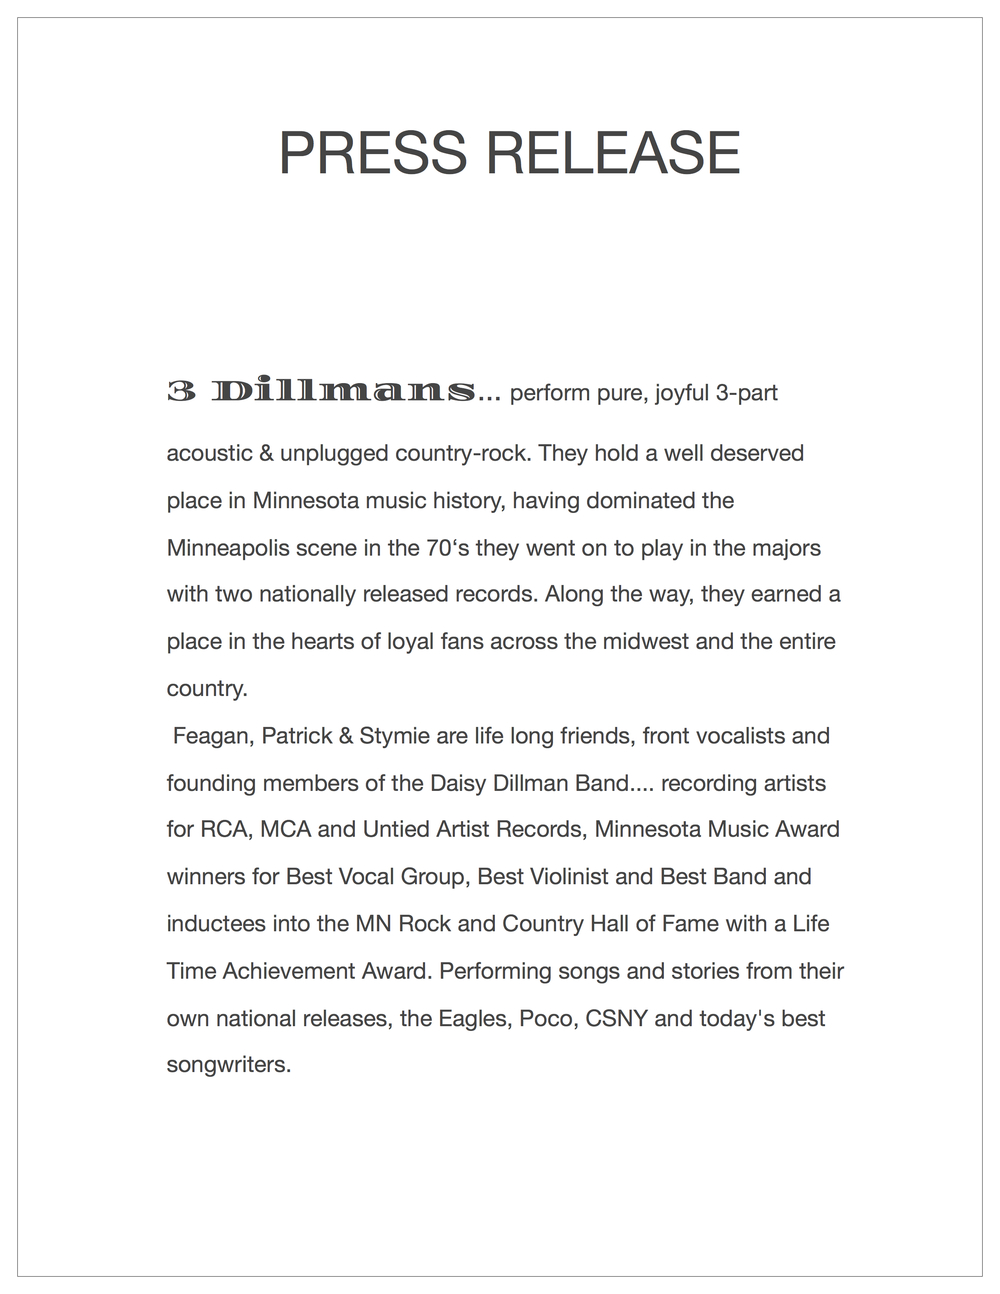 3 Dillmans Press Release.jpg